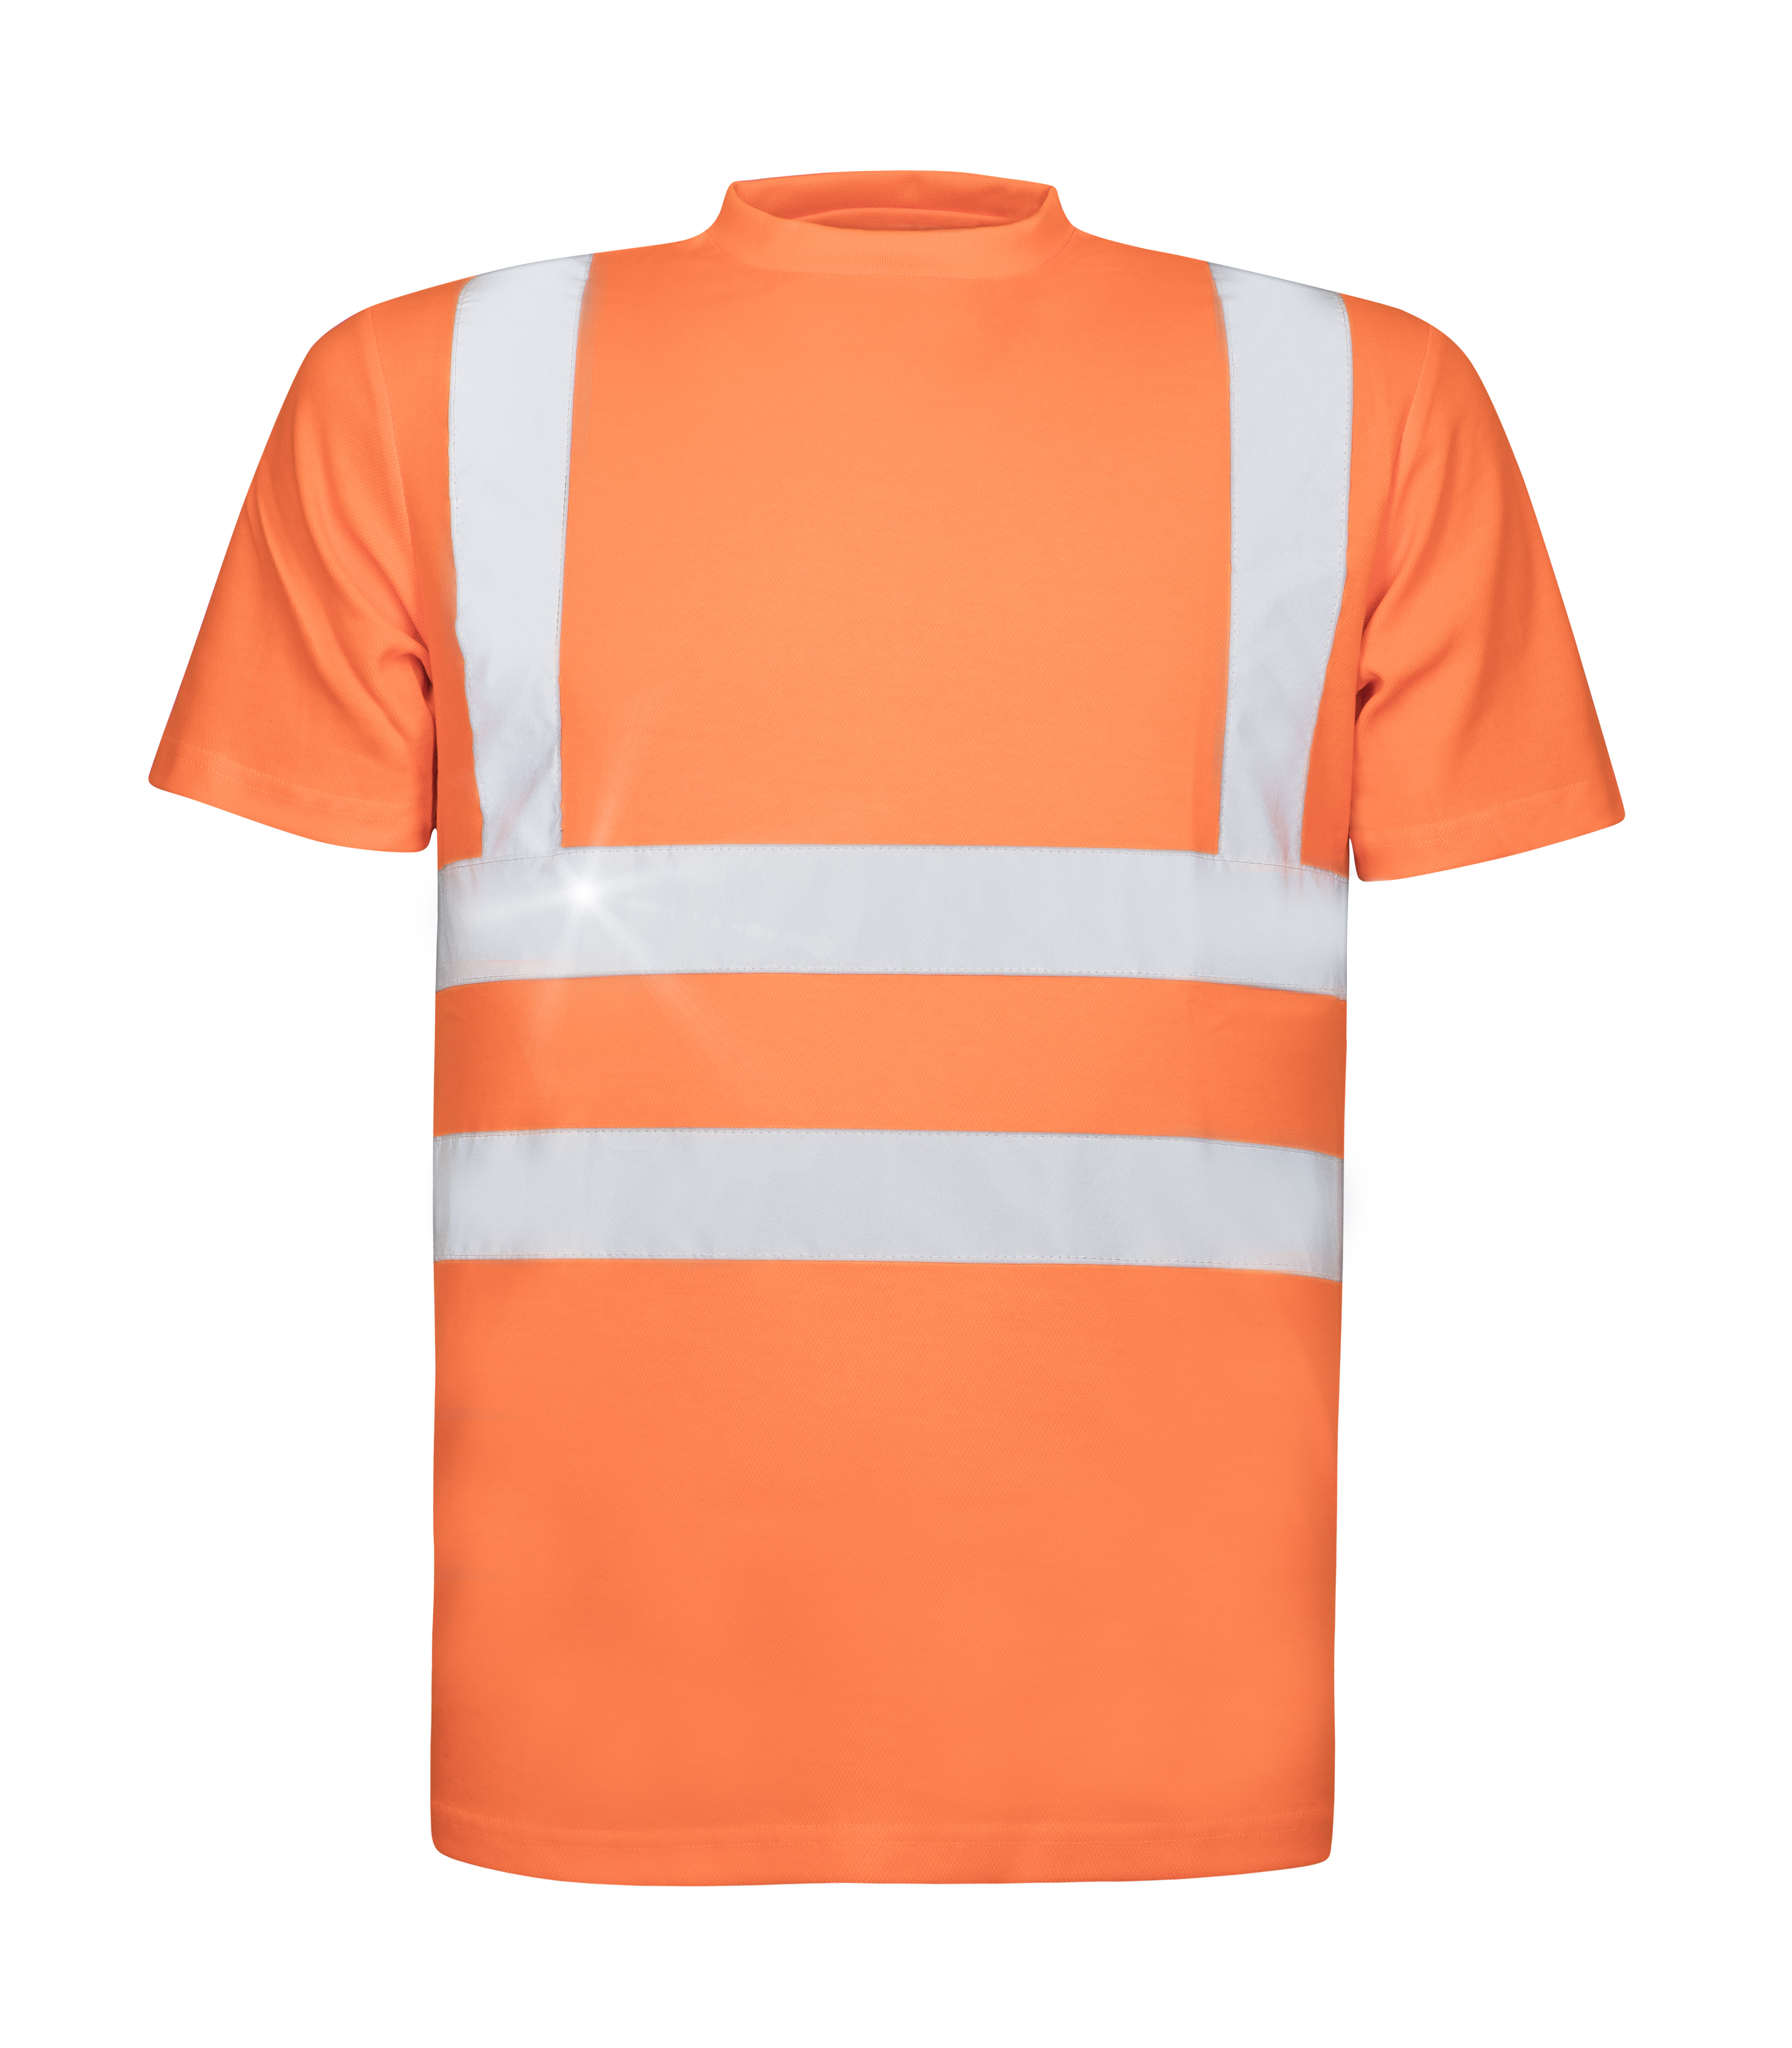 Signalizirajuća Hi-viz T-shirt majica REF 102 narančasta